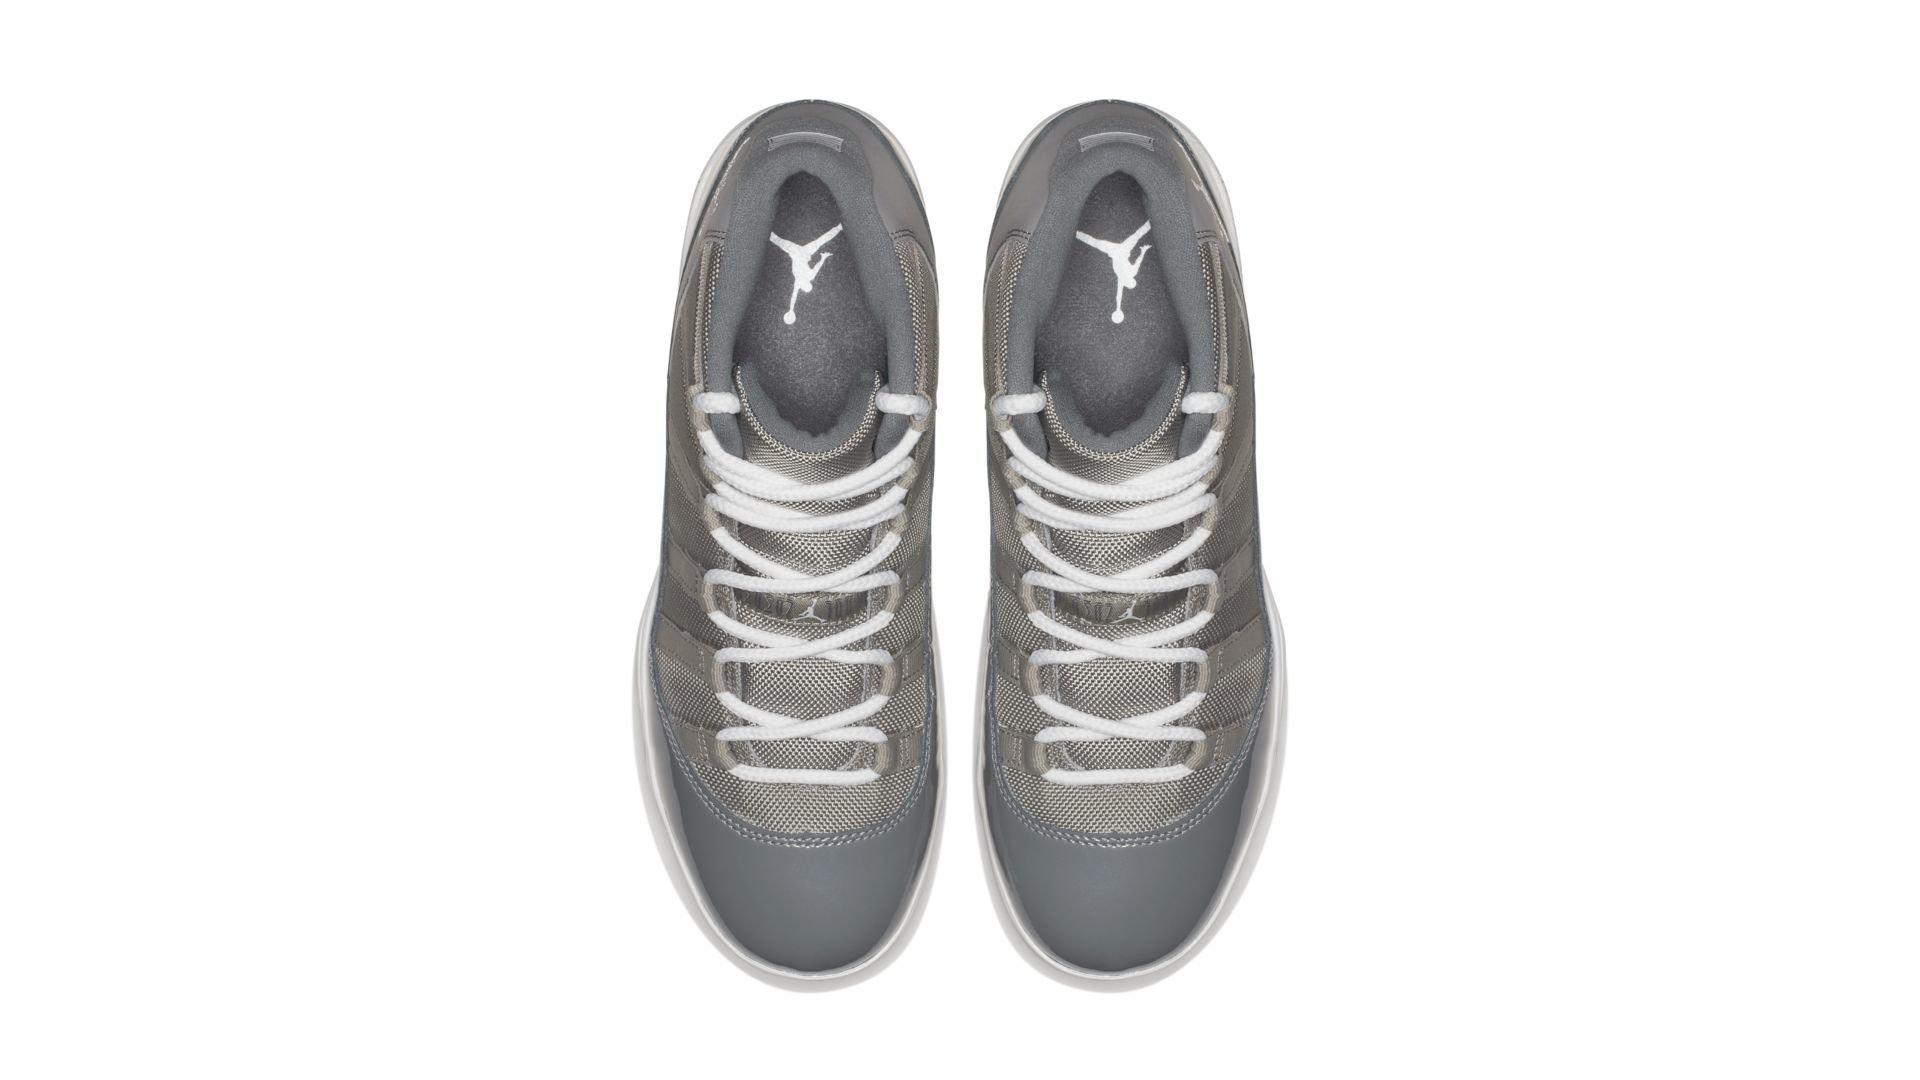 Jordan 11 Retro Cleat Cool Grey (AO1561-003)